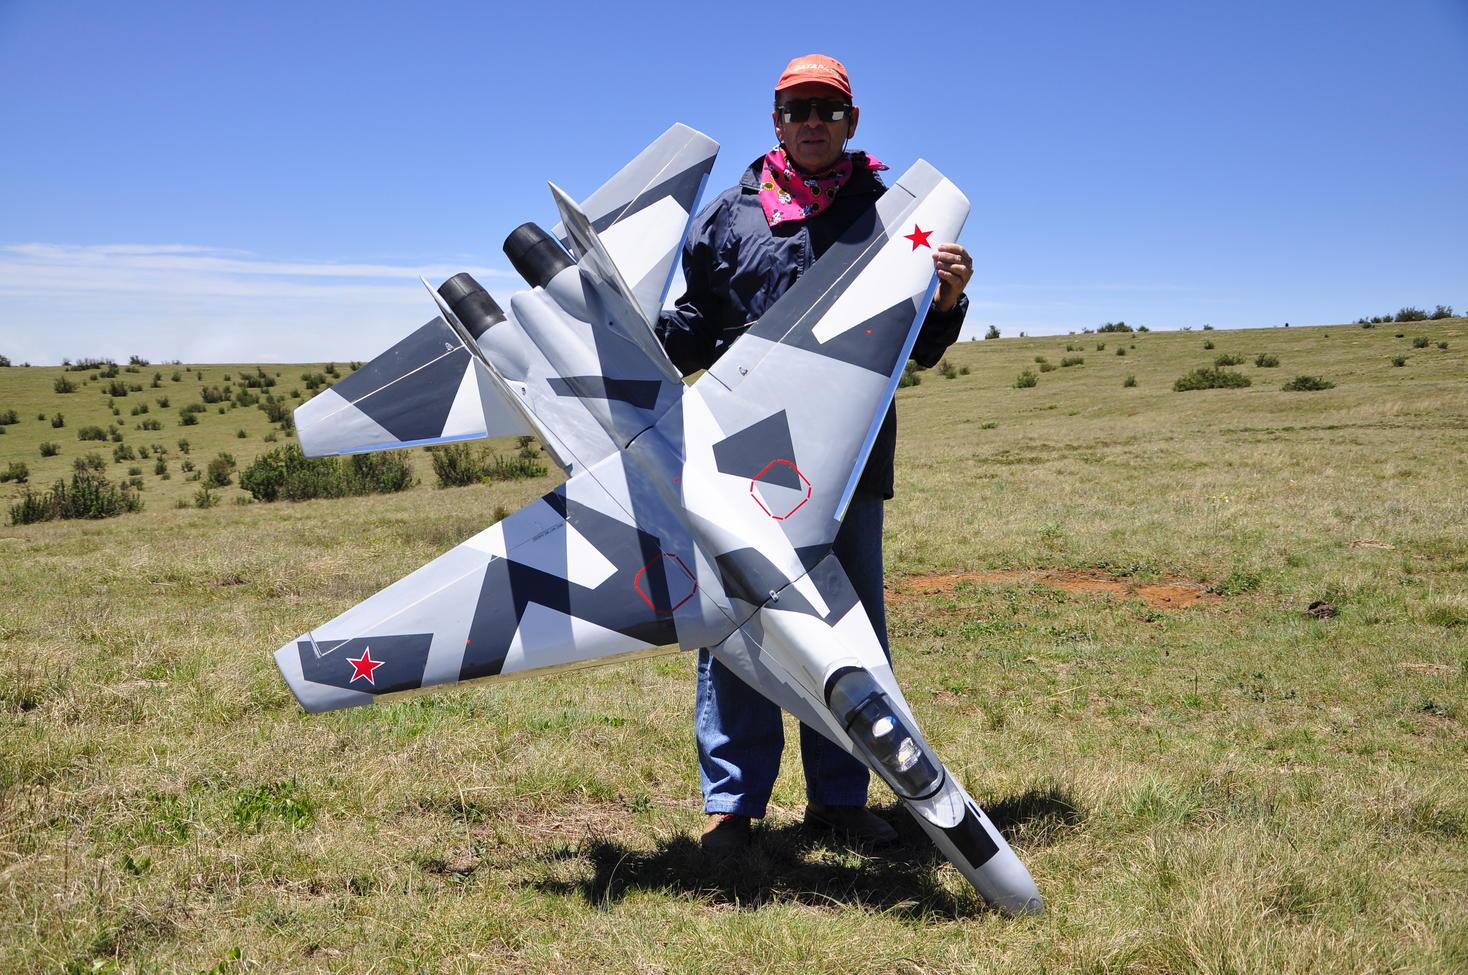 Name: PSSFESTVOLKSRUST2011 041.jpg Views: 356 Size: 302.7 KB Description: SU-35 Super Flanker wing  aspect ratio 1:2 span 1.7mtr